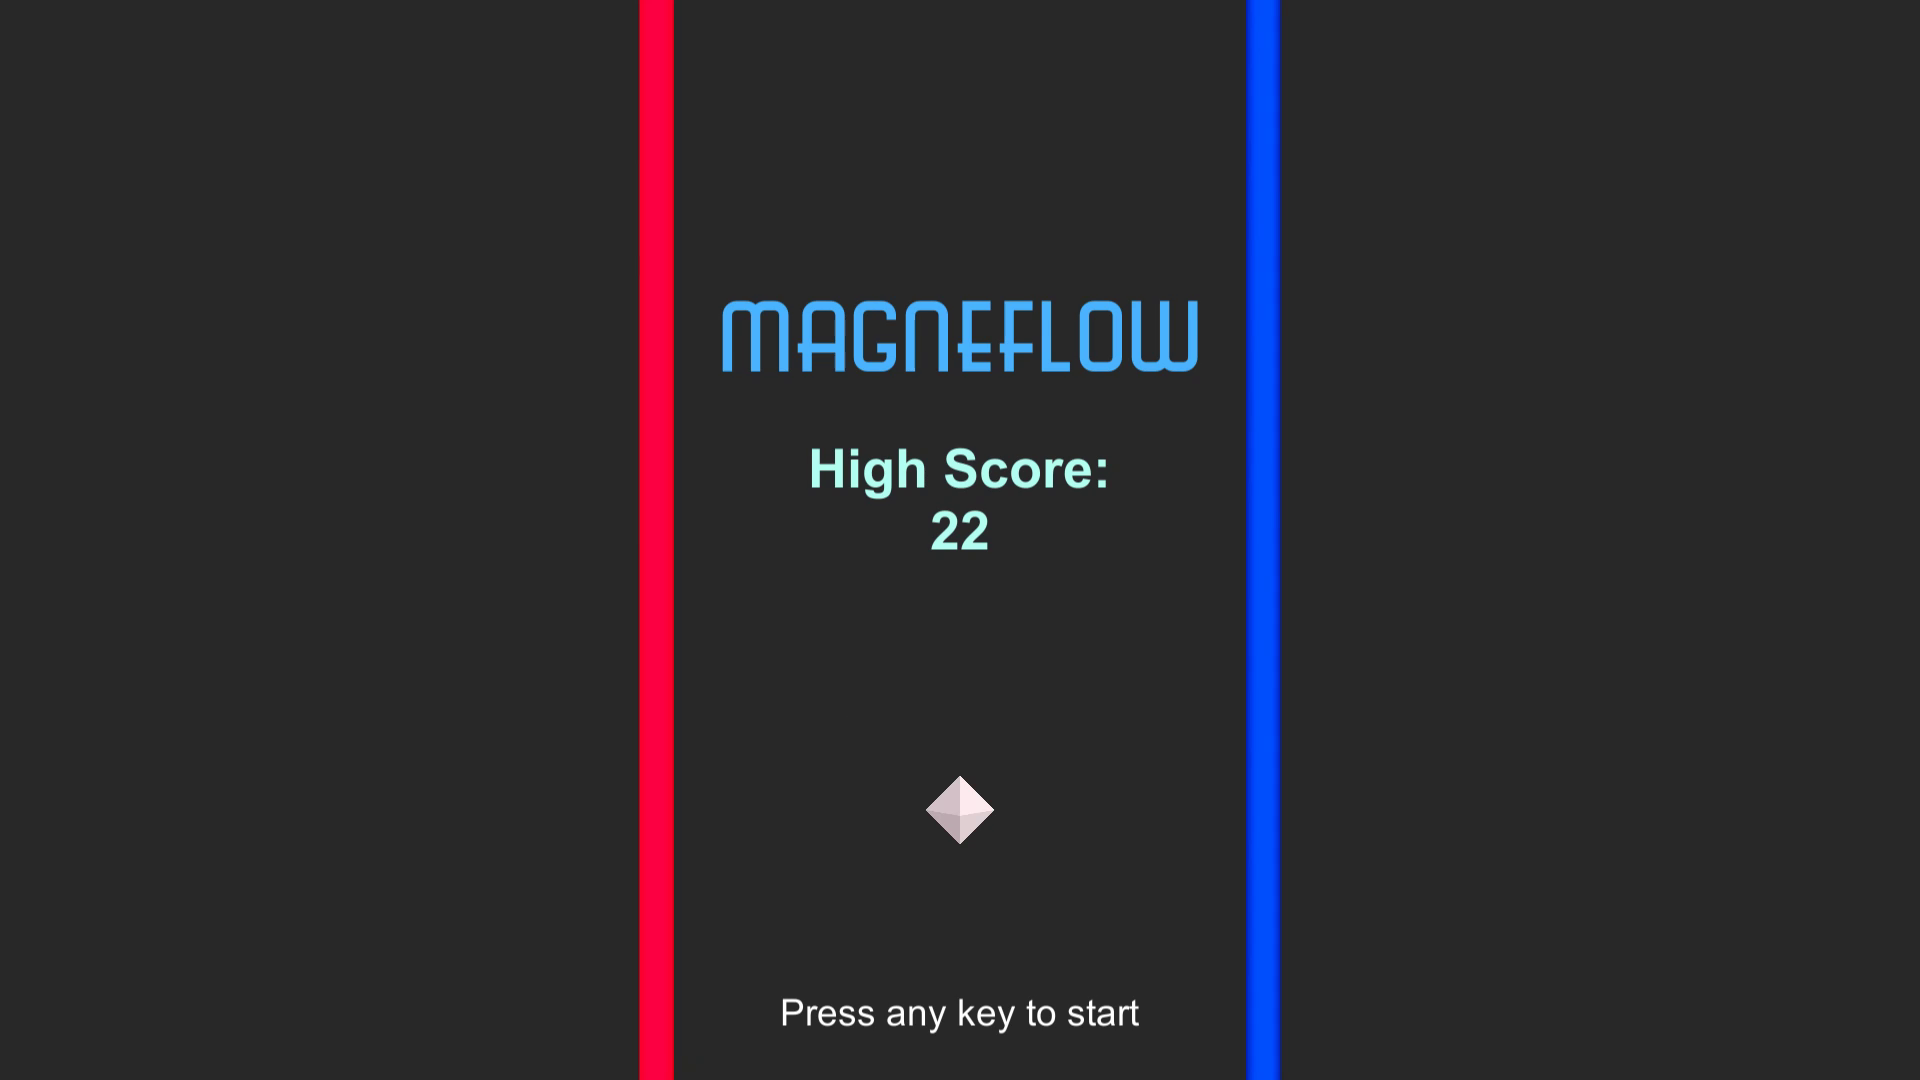 magneflow.png